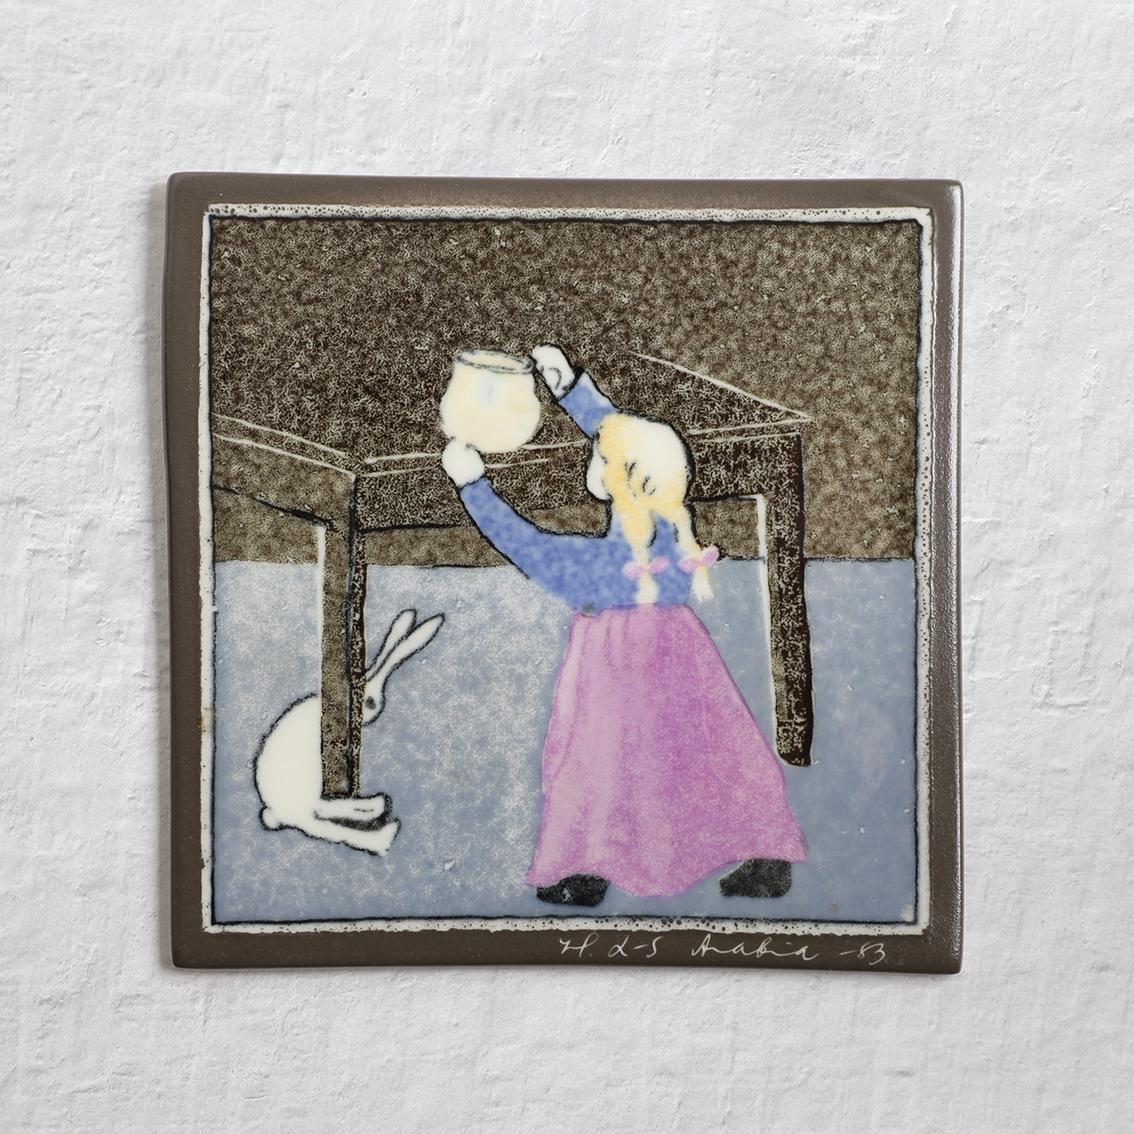 ARABIA アラビア Helja Liukko-Sundstrom ヘルヤ・リウッコ・スンドストロム 少女とうさぎの陶板 北欧ヴィンテージ